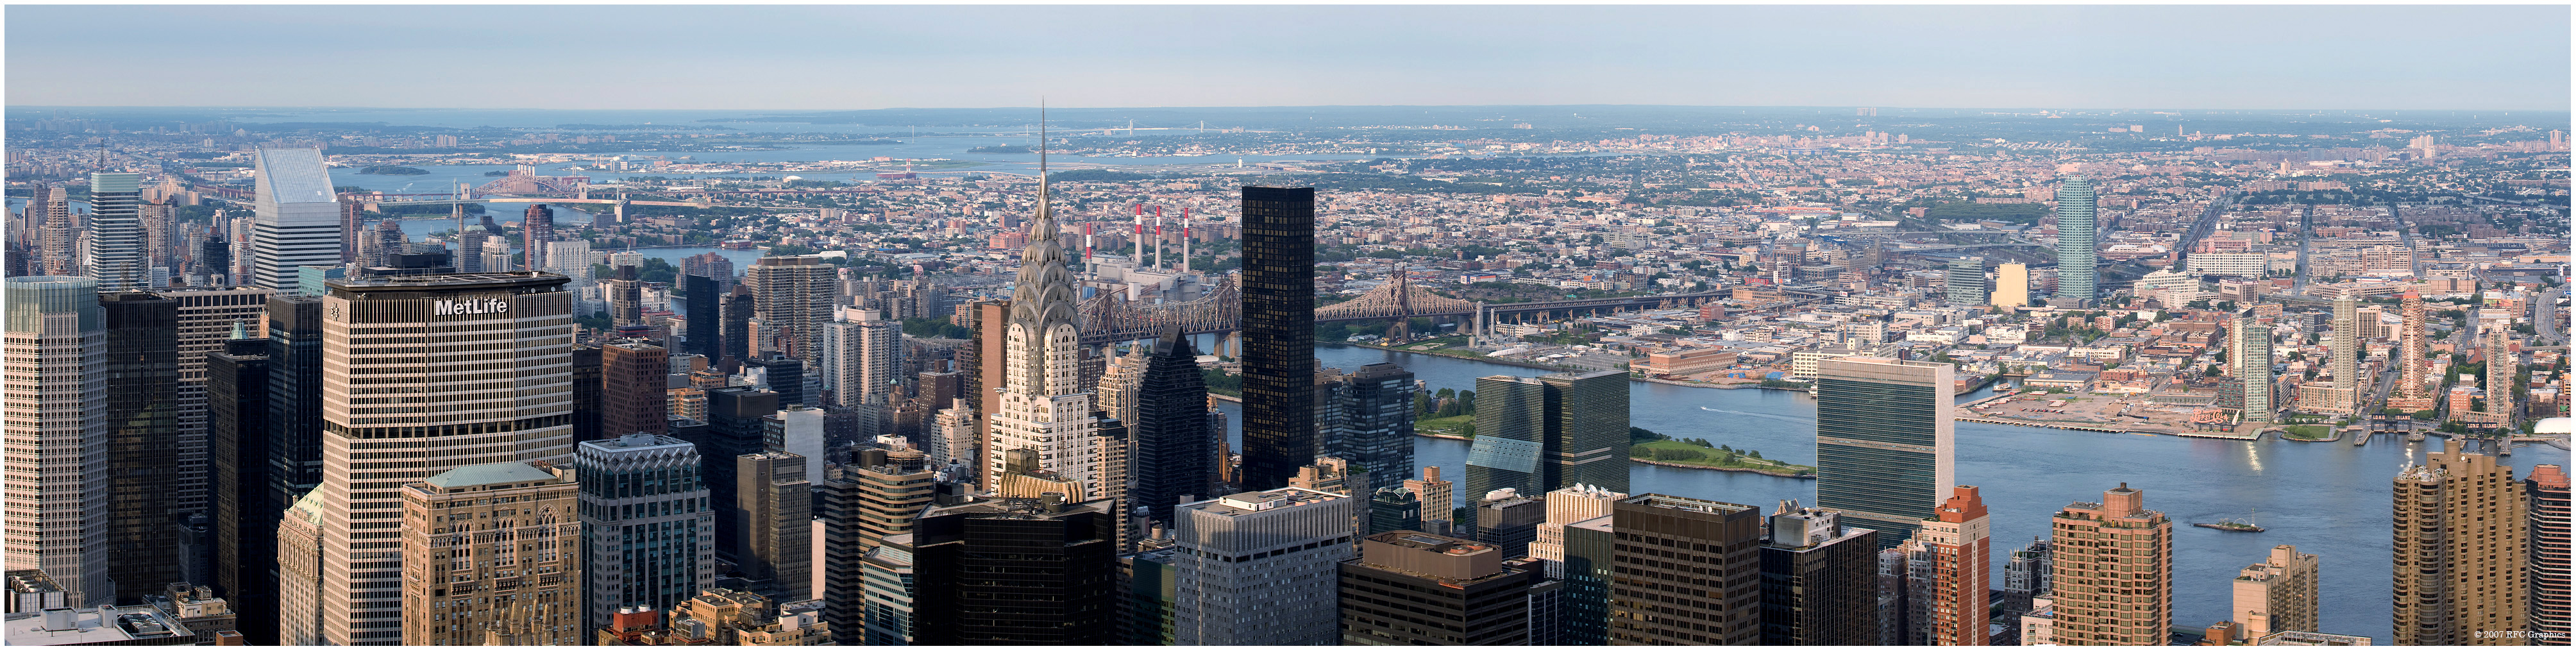 Chrysler Building Panorama